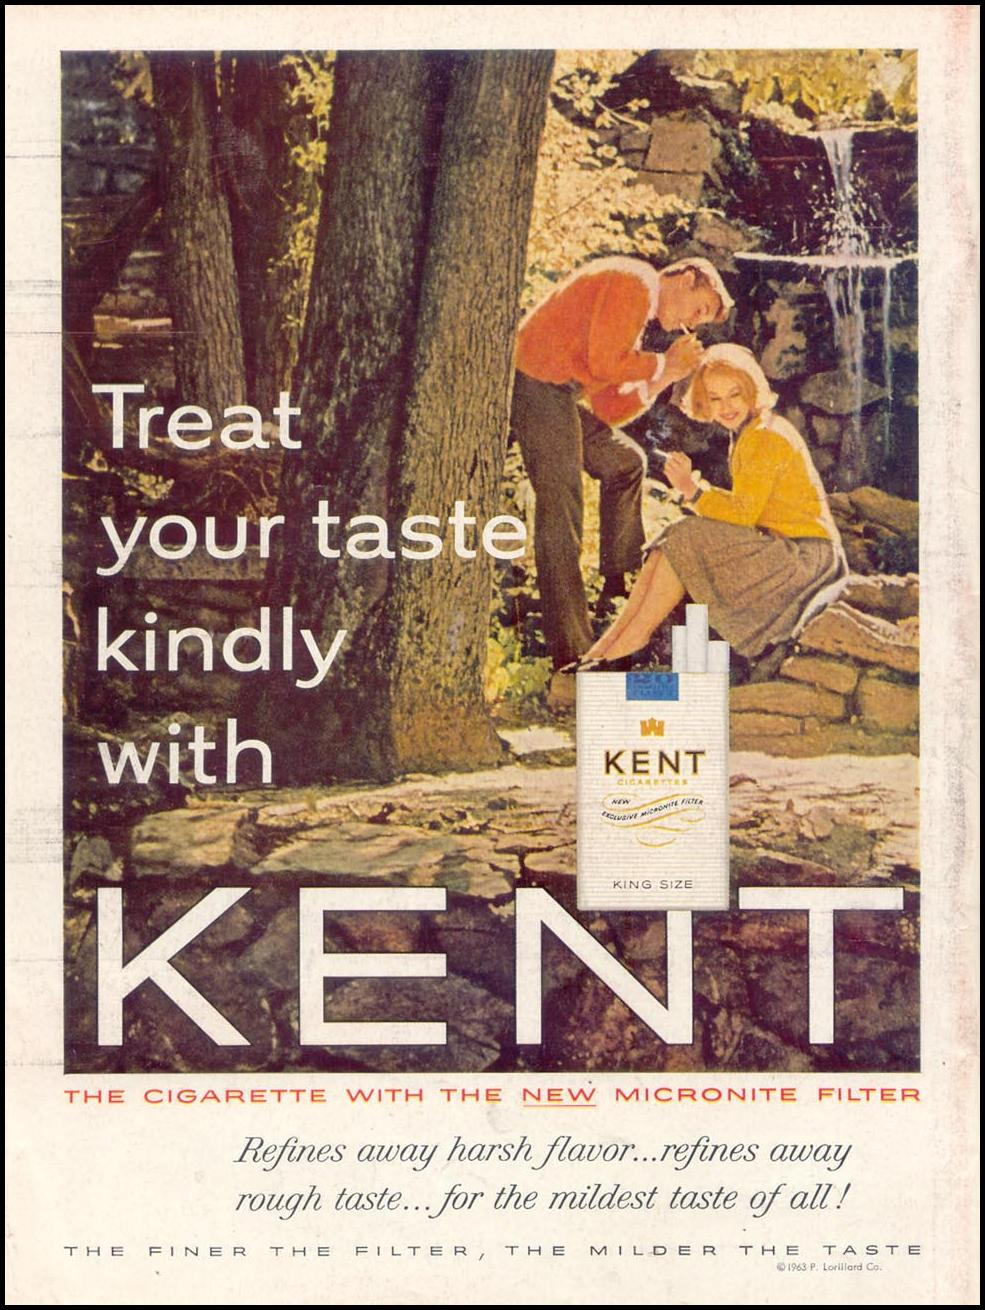 KENT CIGARETTES TIME 05/24/1963 BACK COVER